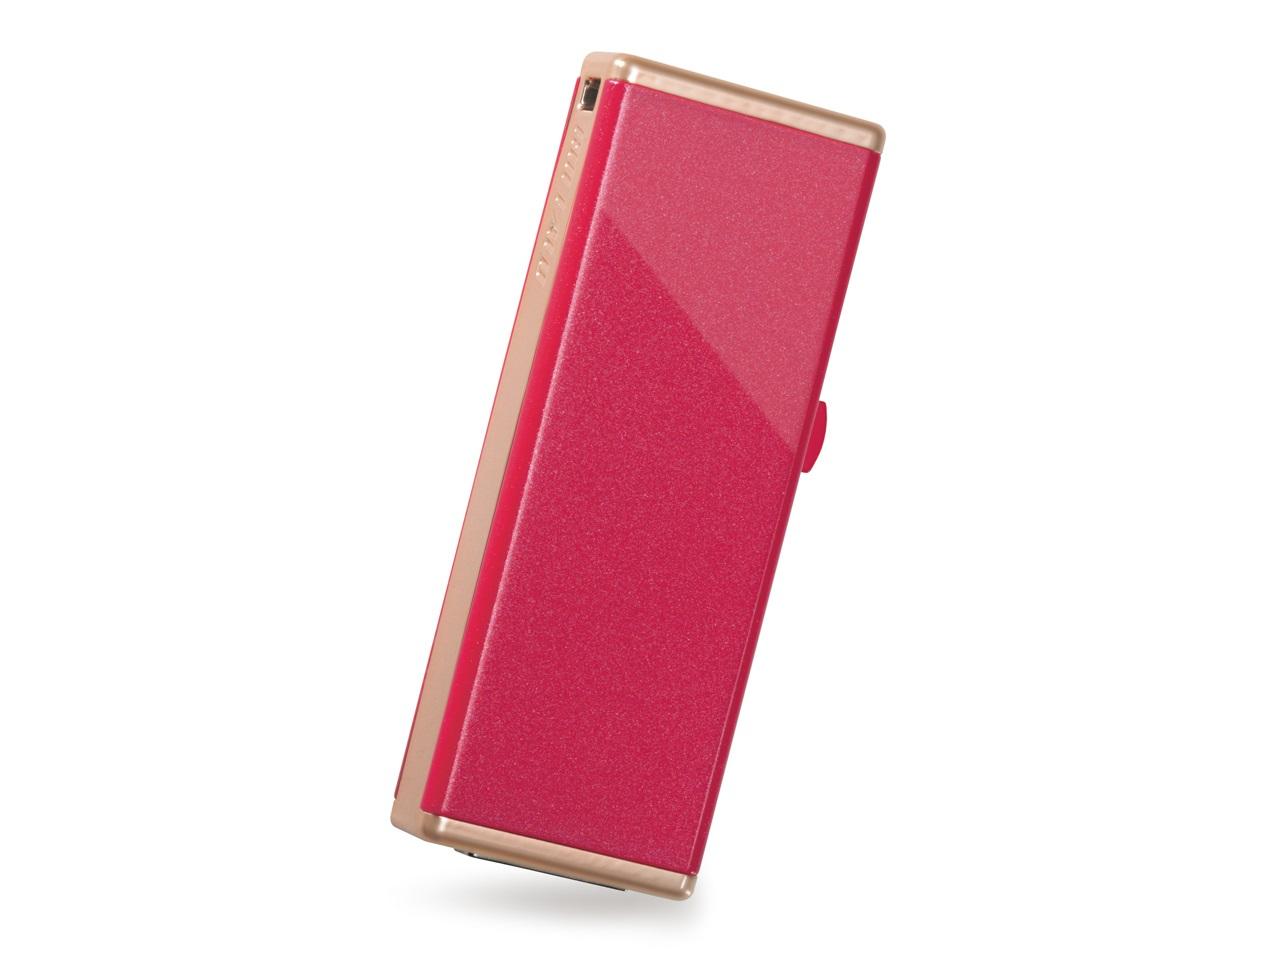 Buffalo RUF3-JW16G-GP 16GB 2.0/3.0 (3.1 Gen 1) Numero di grucce Rosa unità flash USB